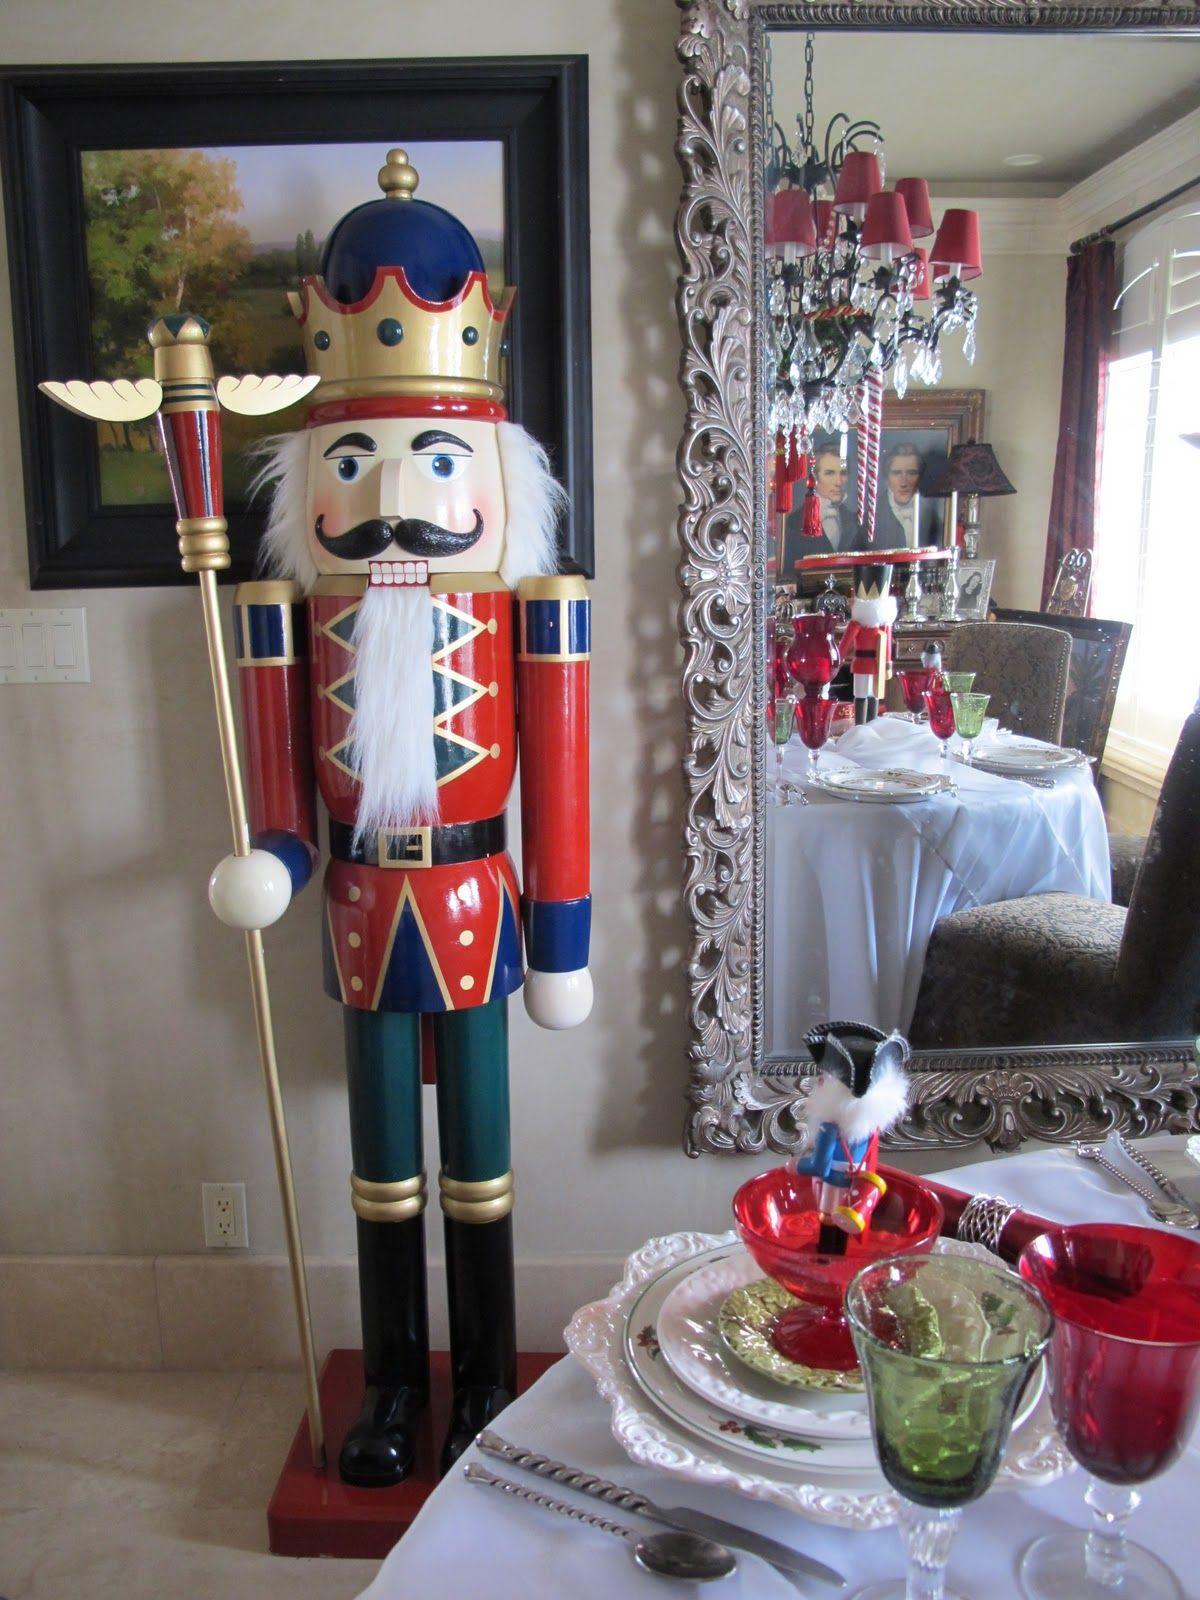 6 Ft Nutcracker Christmas Christmas Decorations